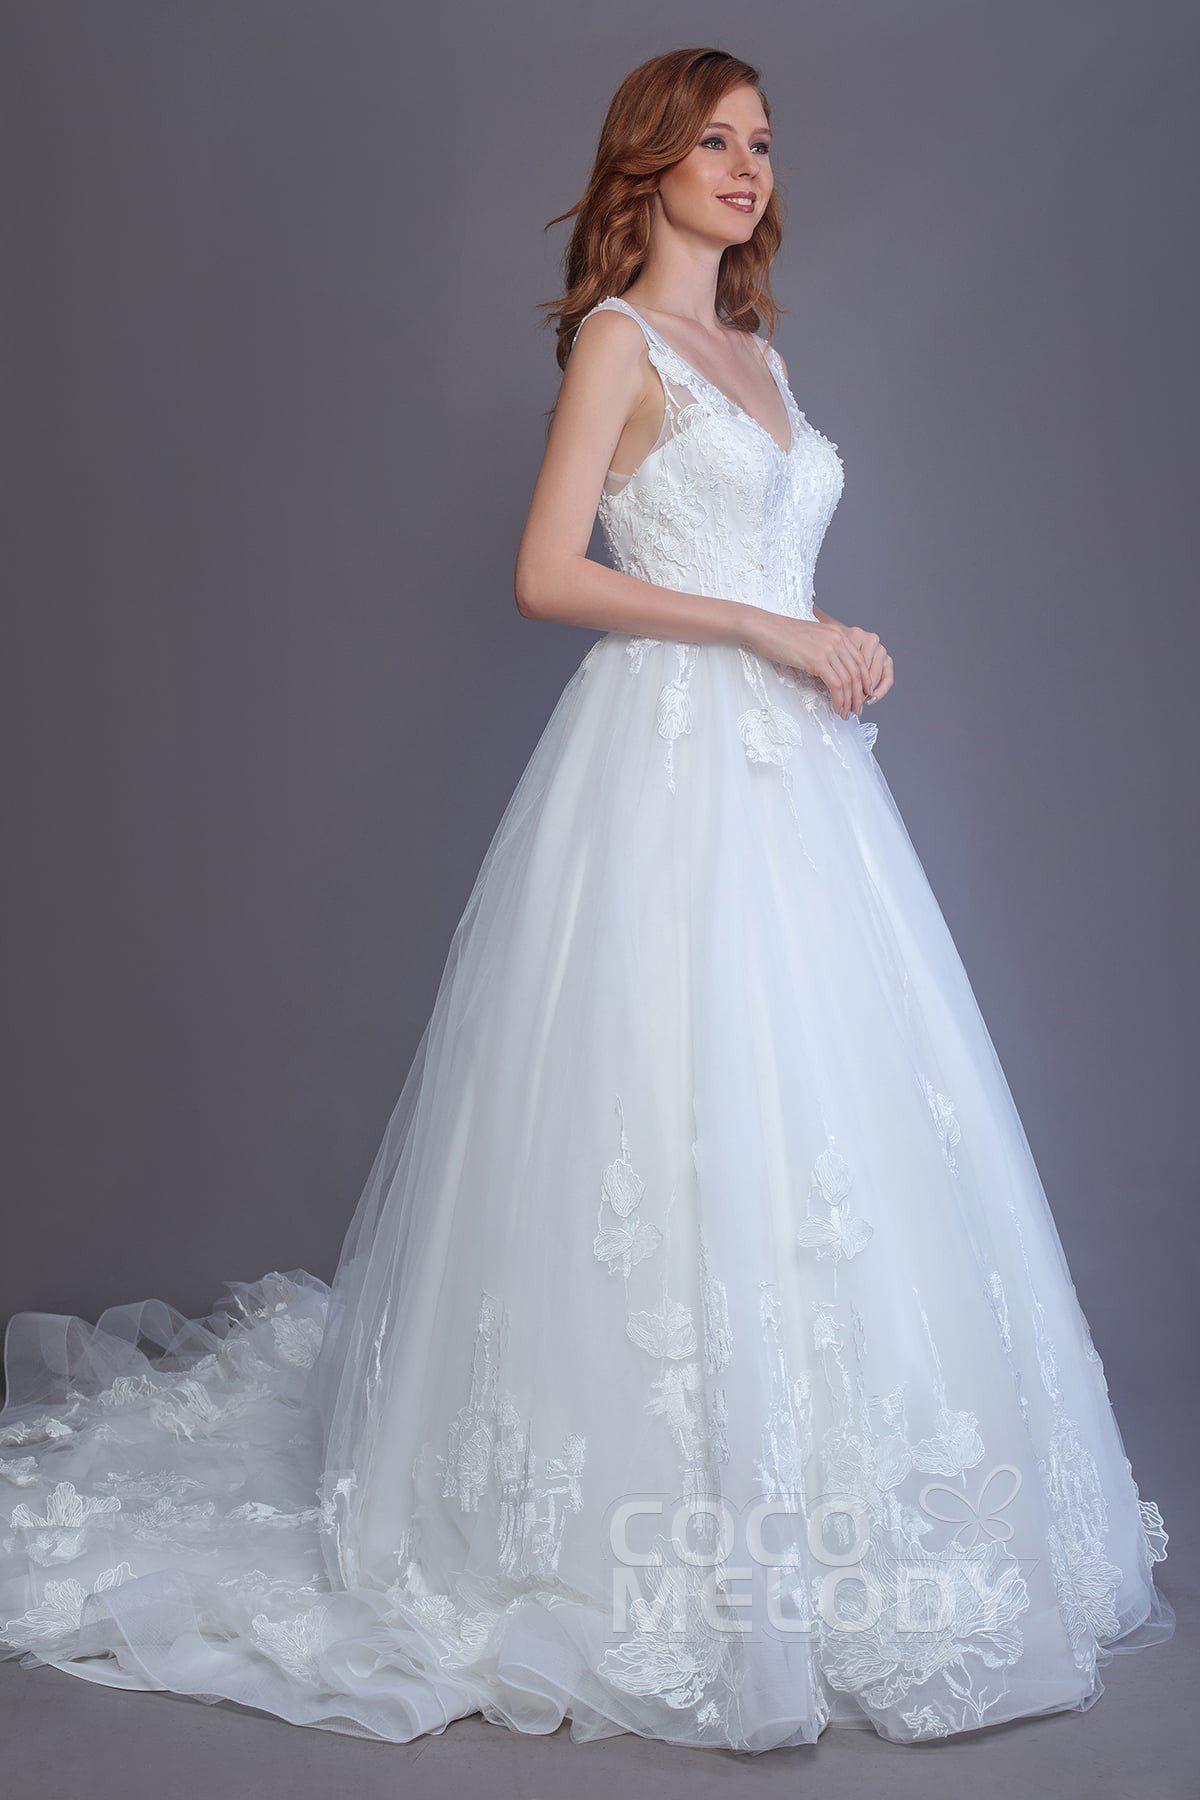 Princess Chapel Train Tulle Lace and Organza Wedding Dress LD5716 ...